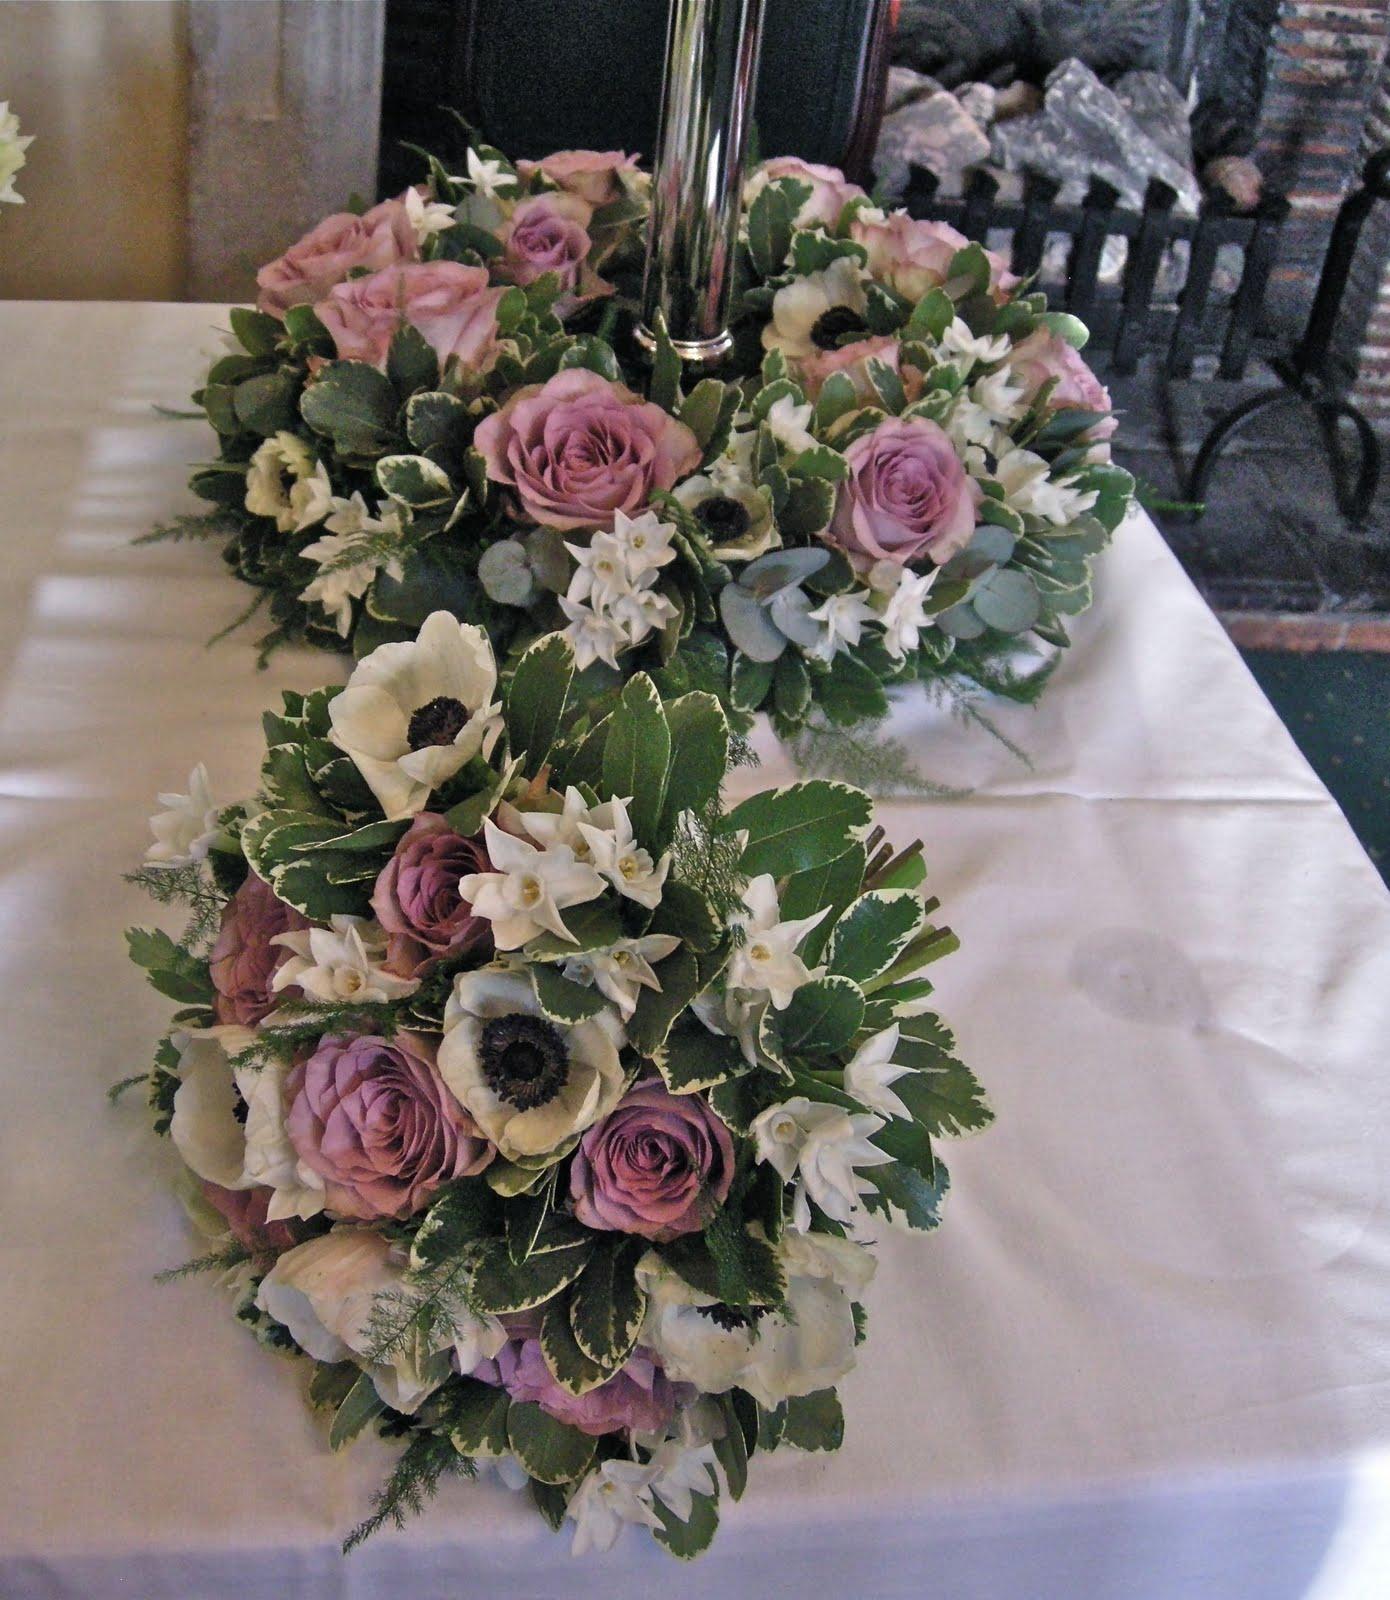 Vintage Wedding Flower Bouquets: Wedding Flowers Blog: Winter Wedding Flowers